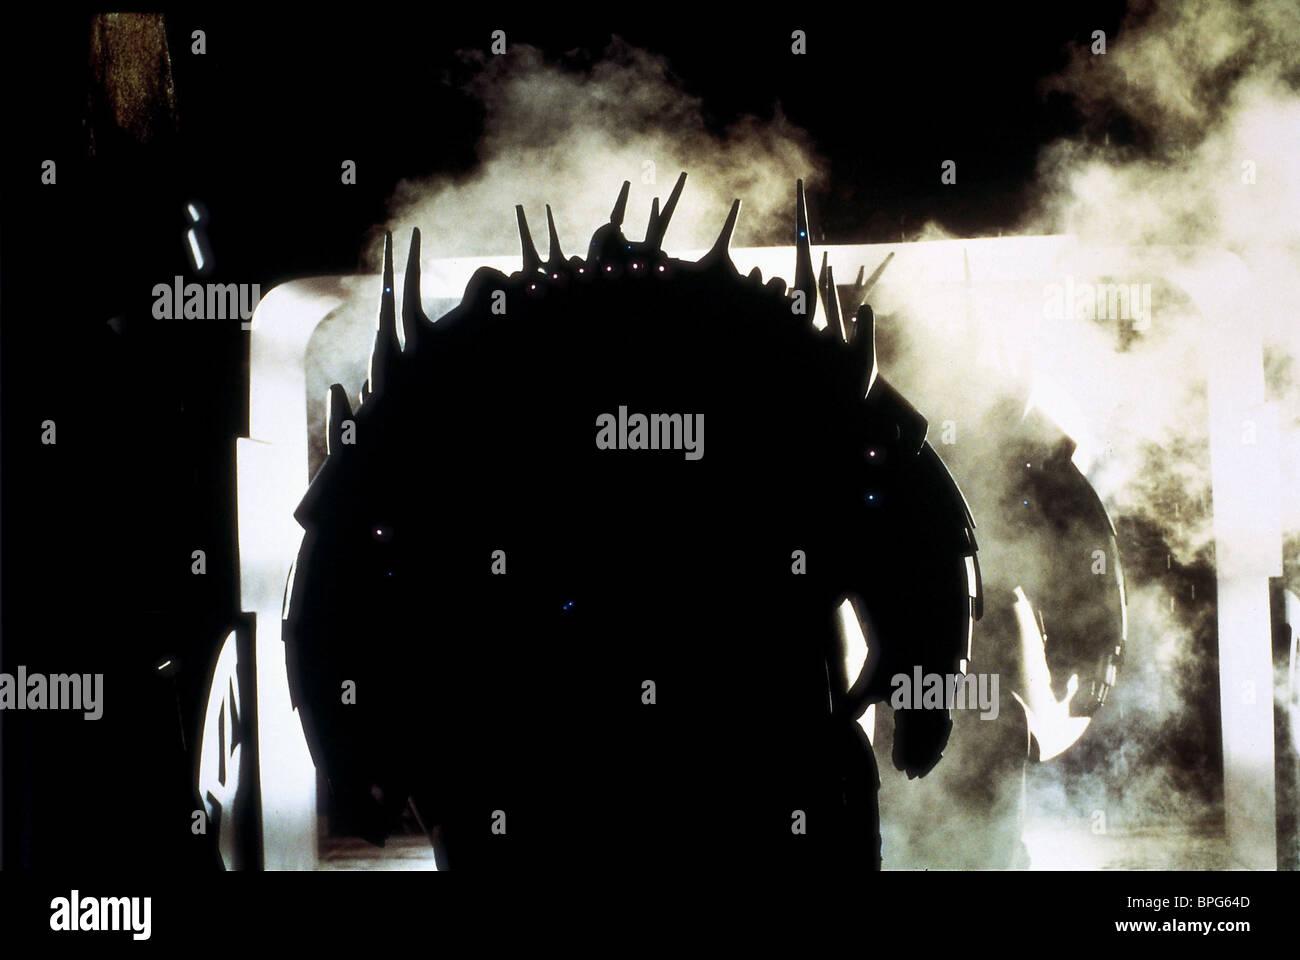 MONDOSHAWAN THE FIFTH ELEMENT (1997) - Stock Image